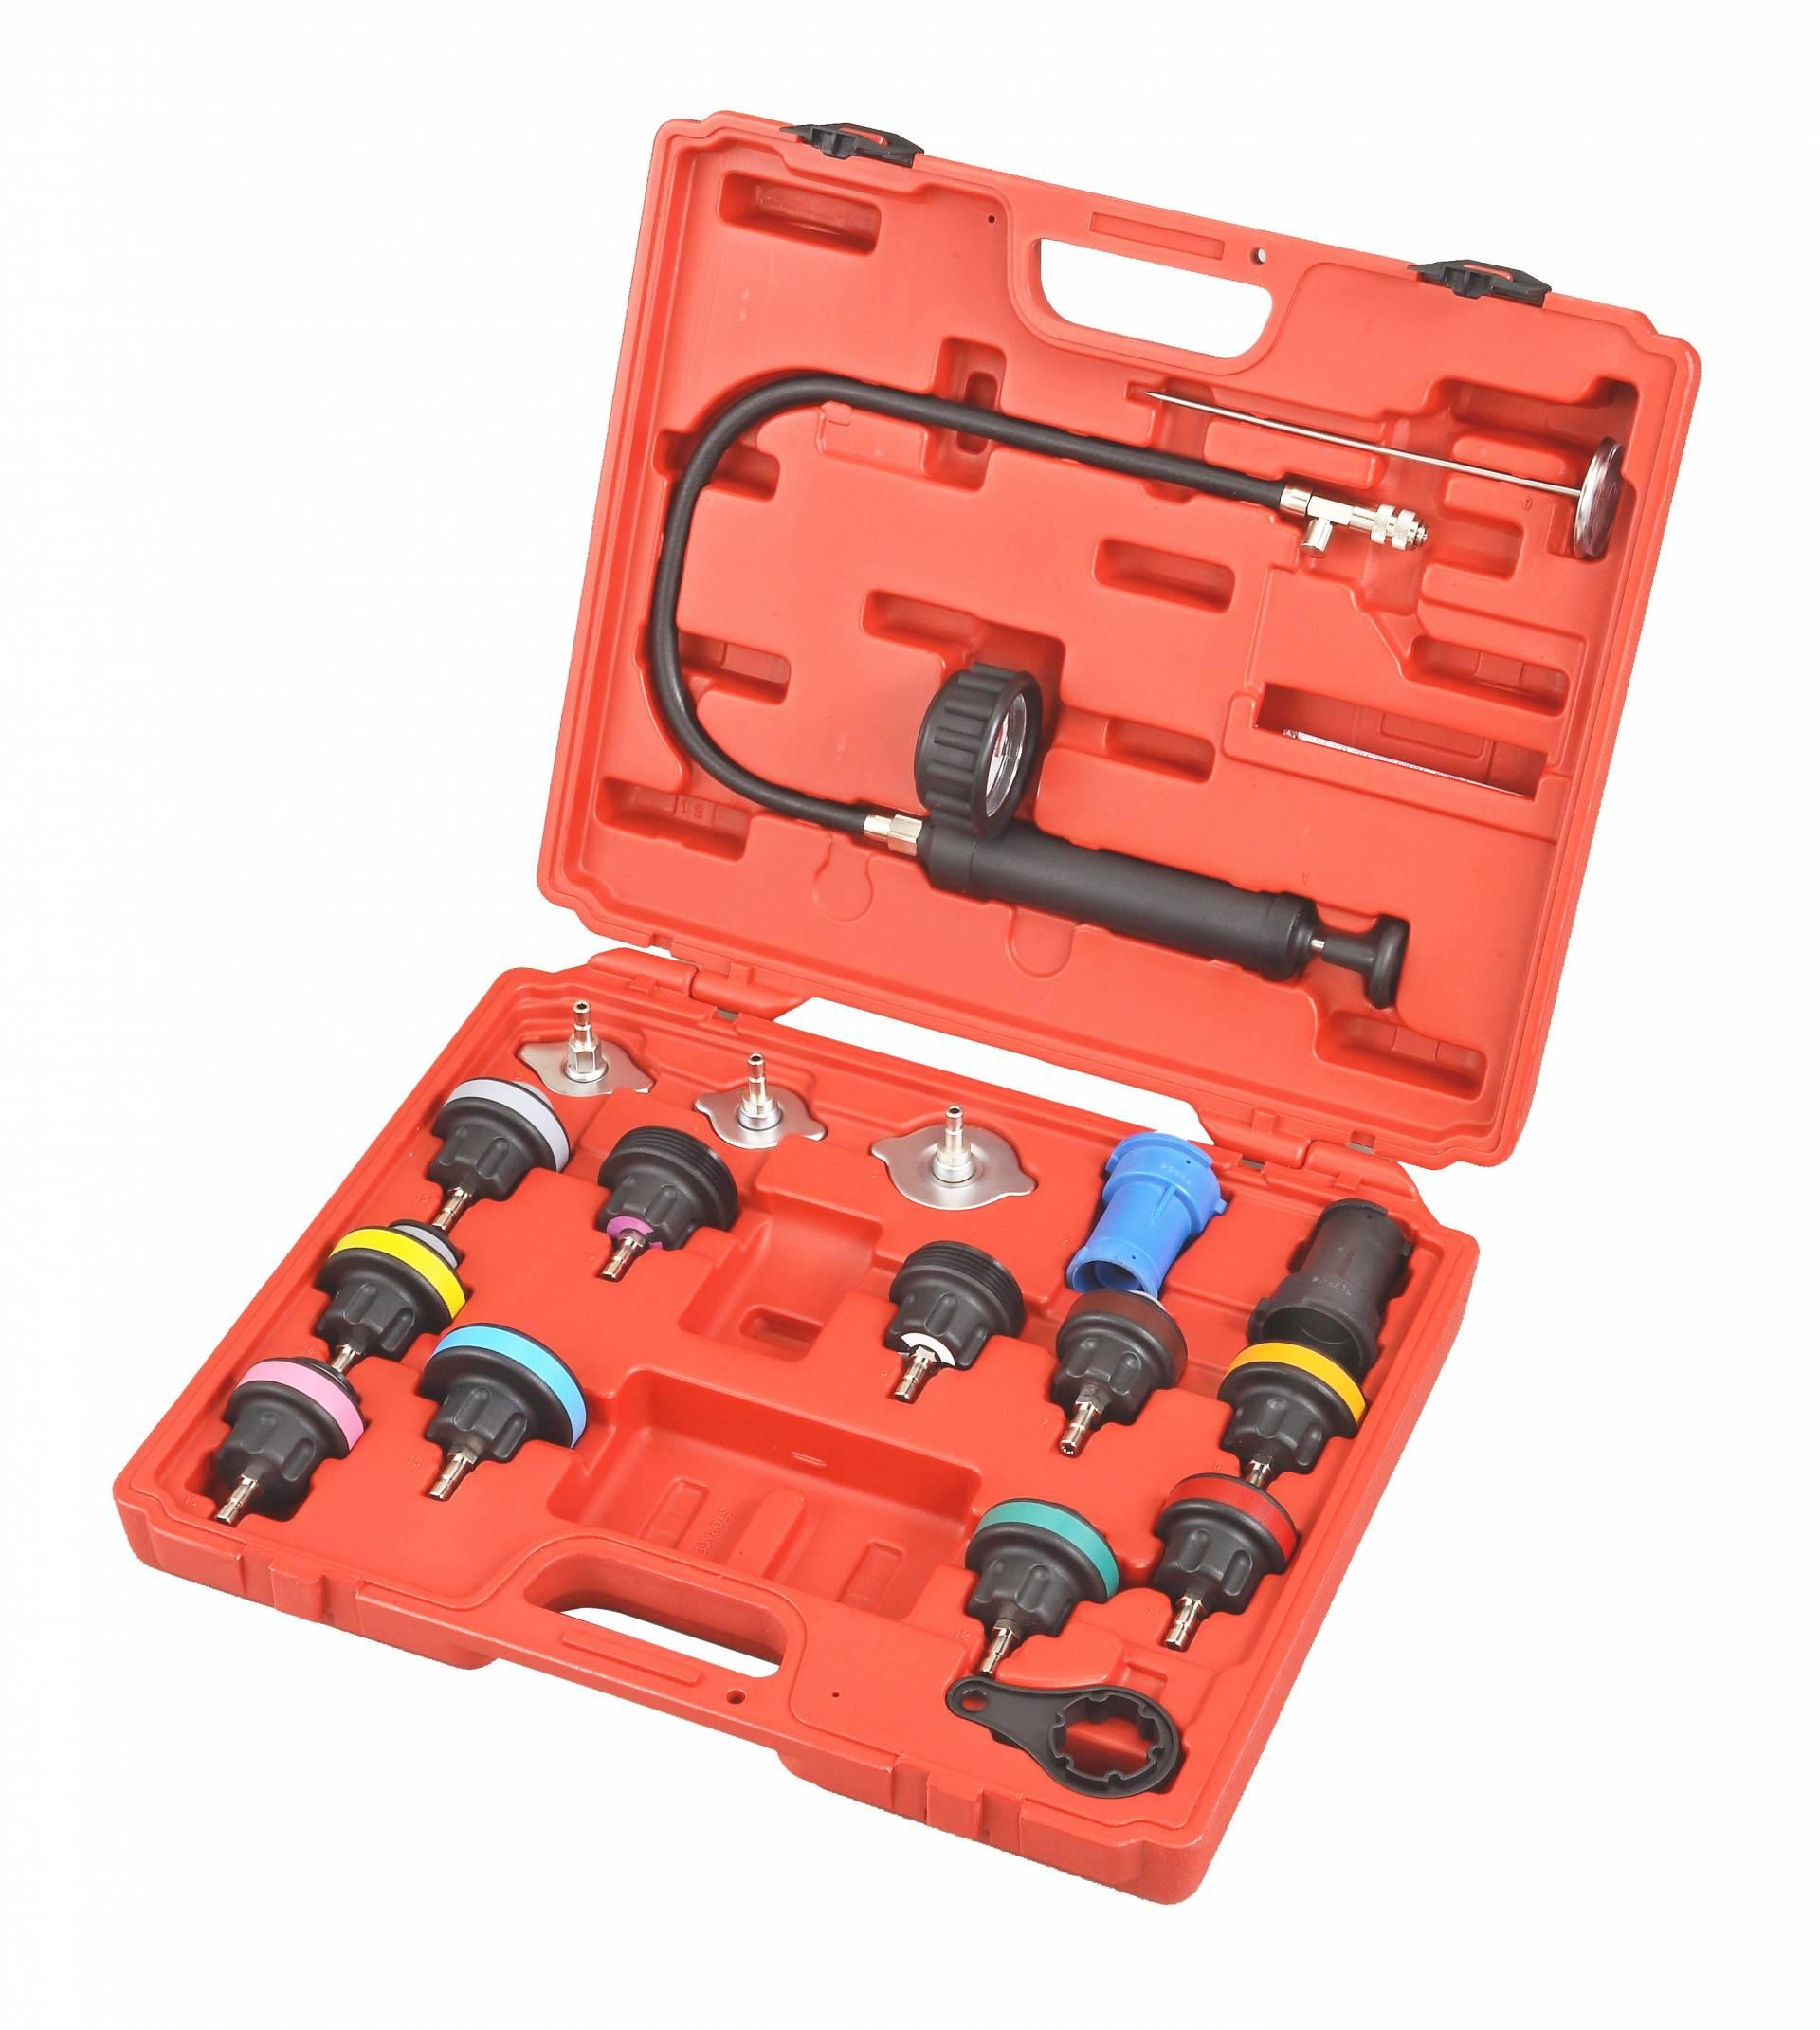 Universal Radiator Pressure Test Kit 18pcs Supply